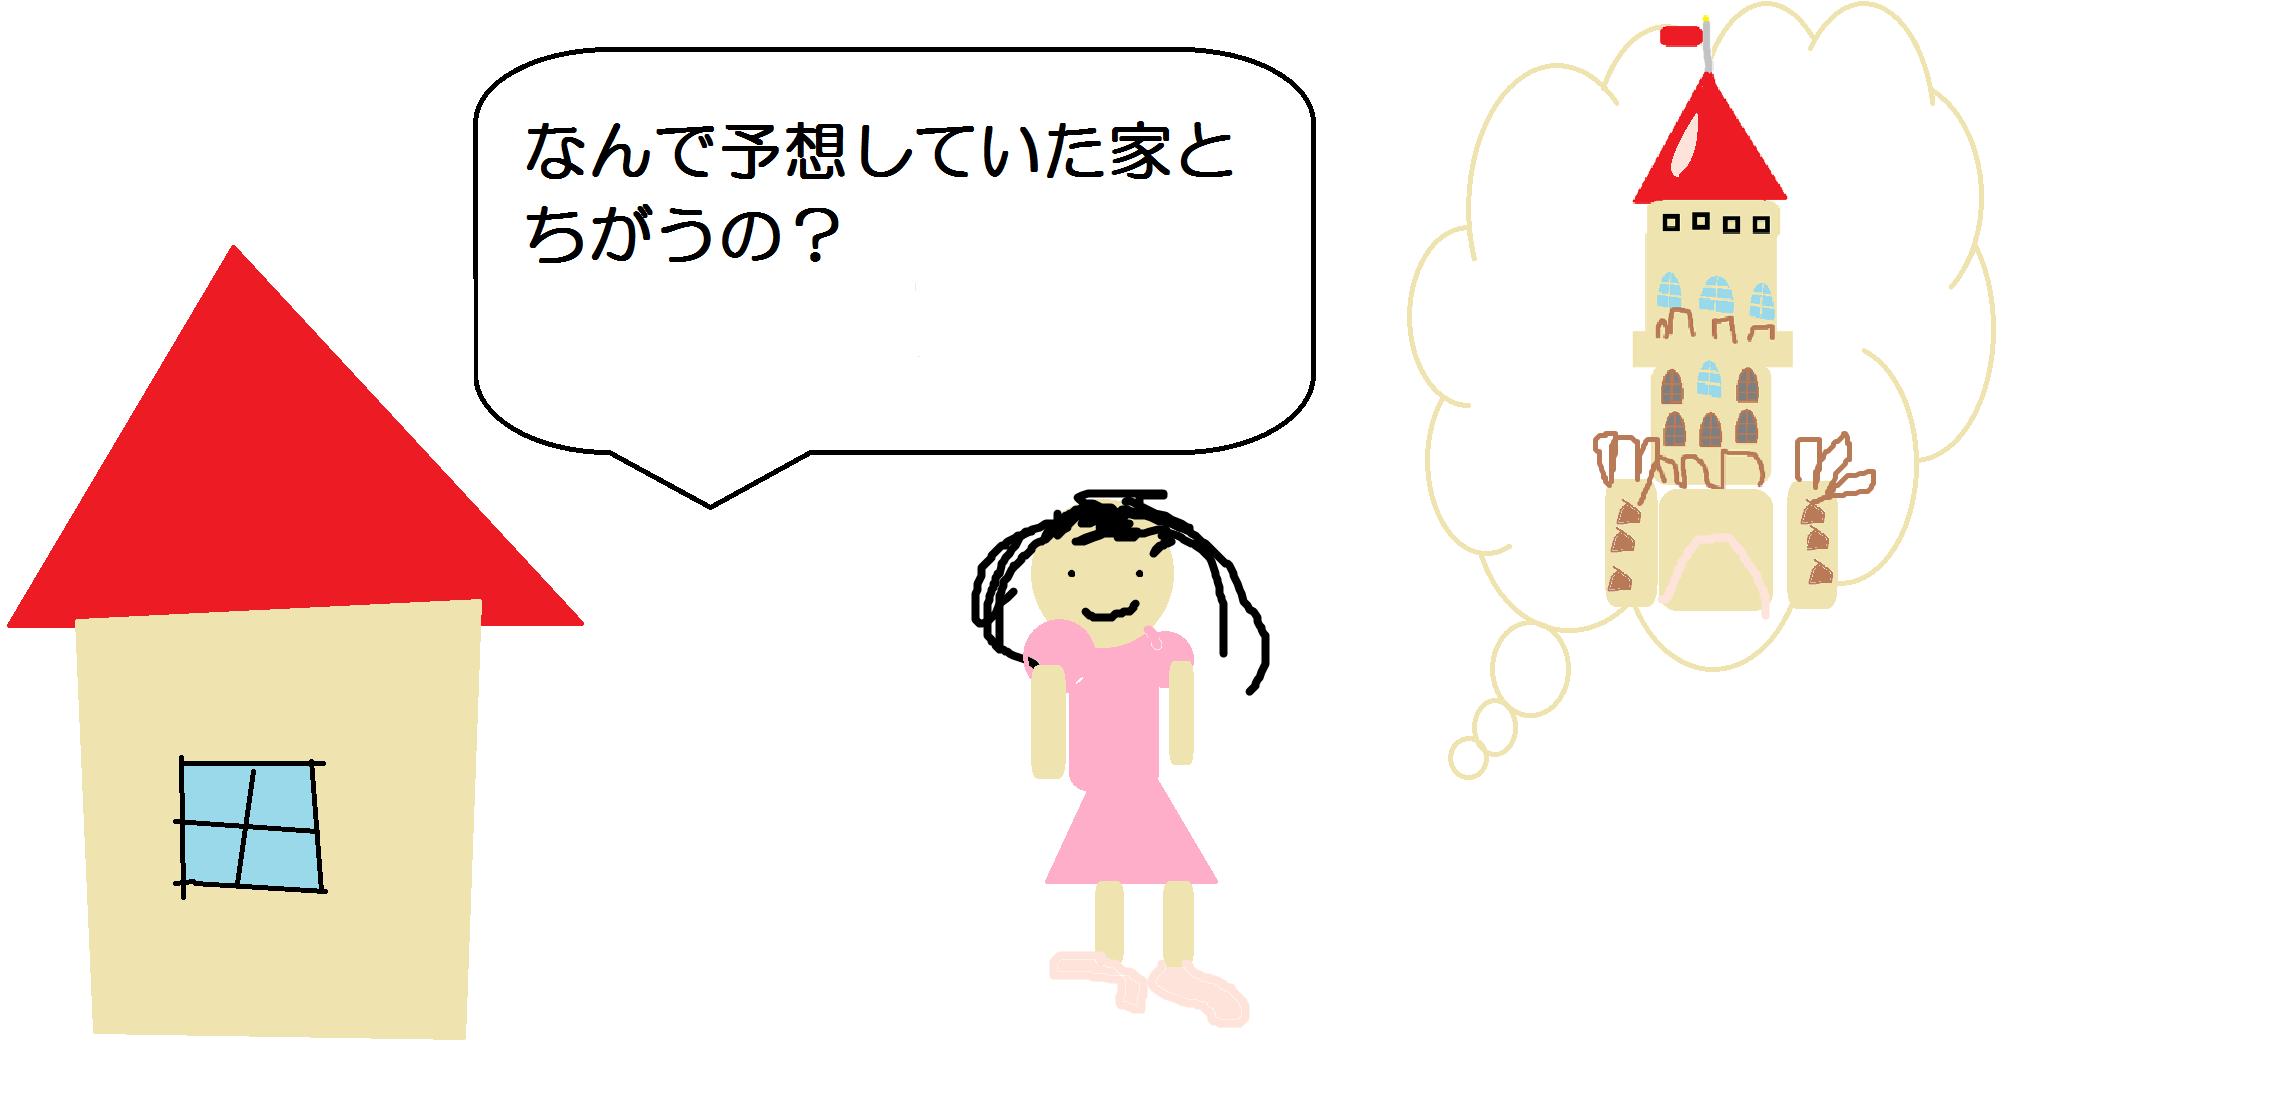 sakuhinn_gifu_paint_2.png